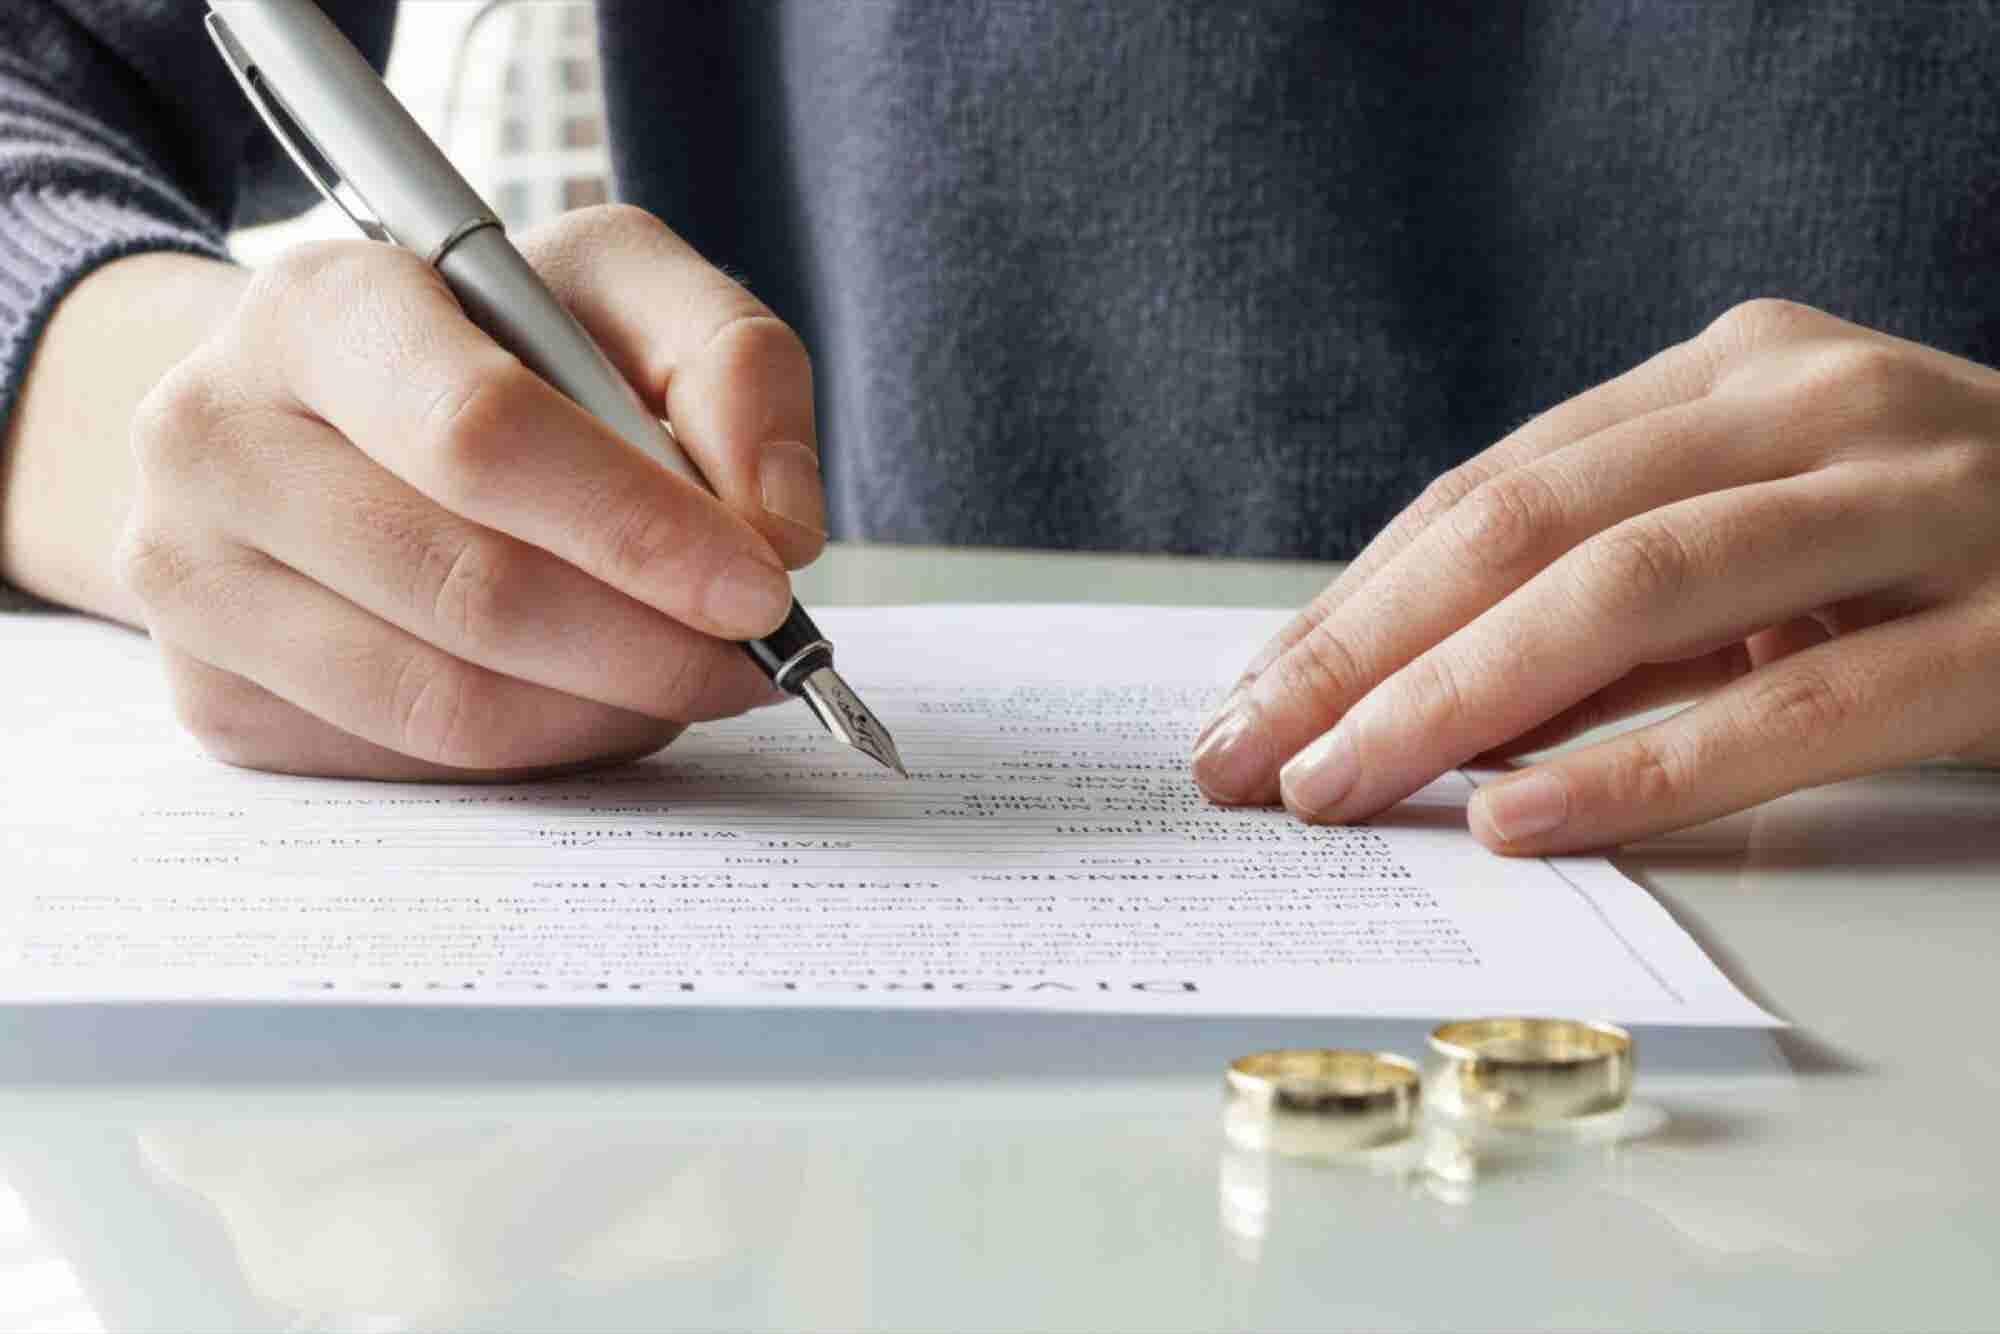 7 Ways to Rebuild Your Financial Life Post-Divorce